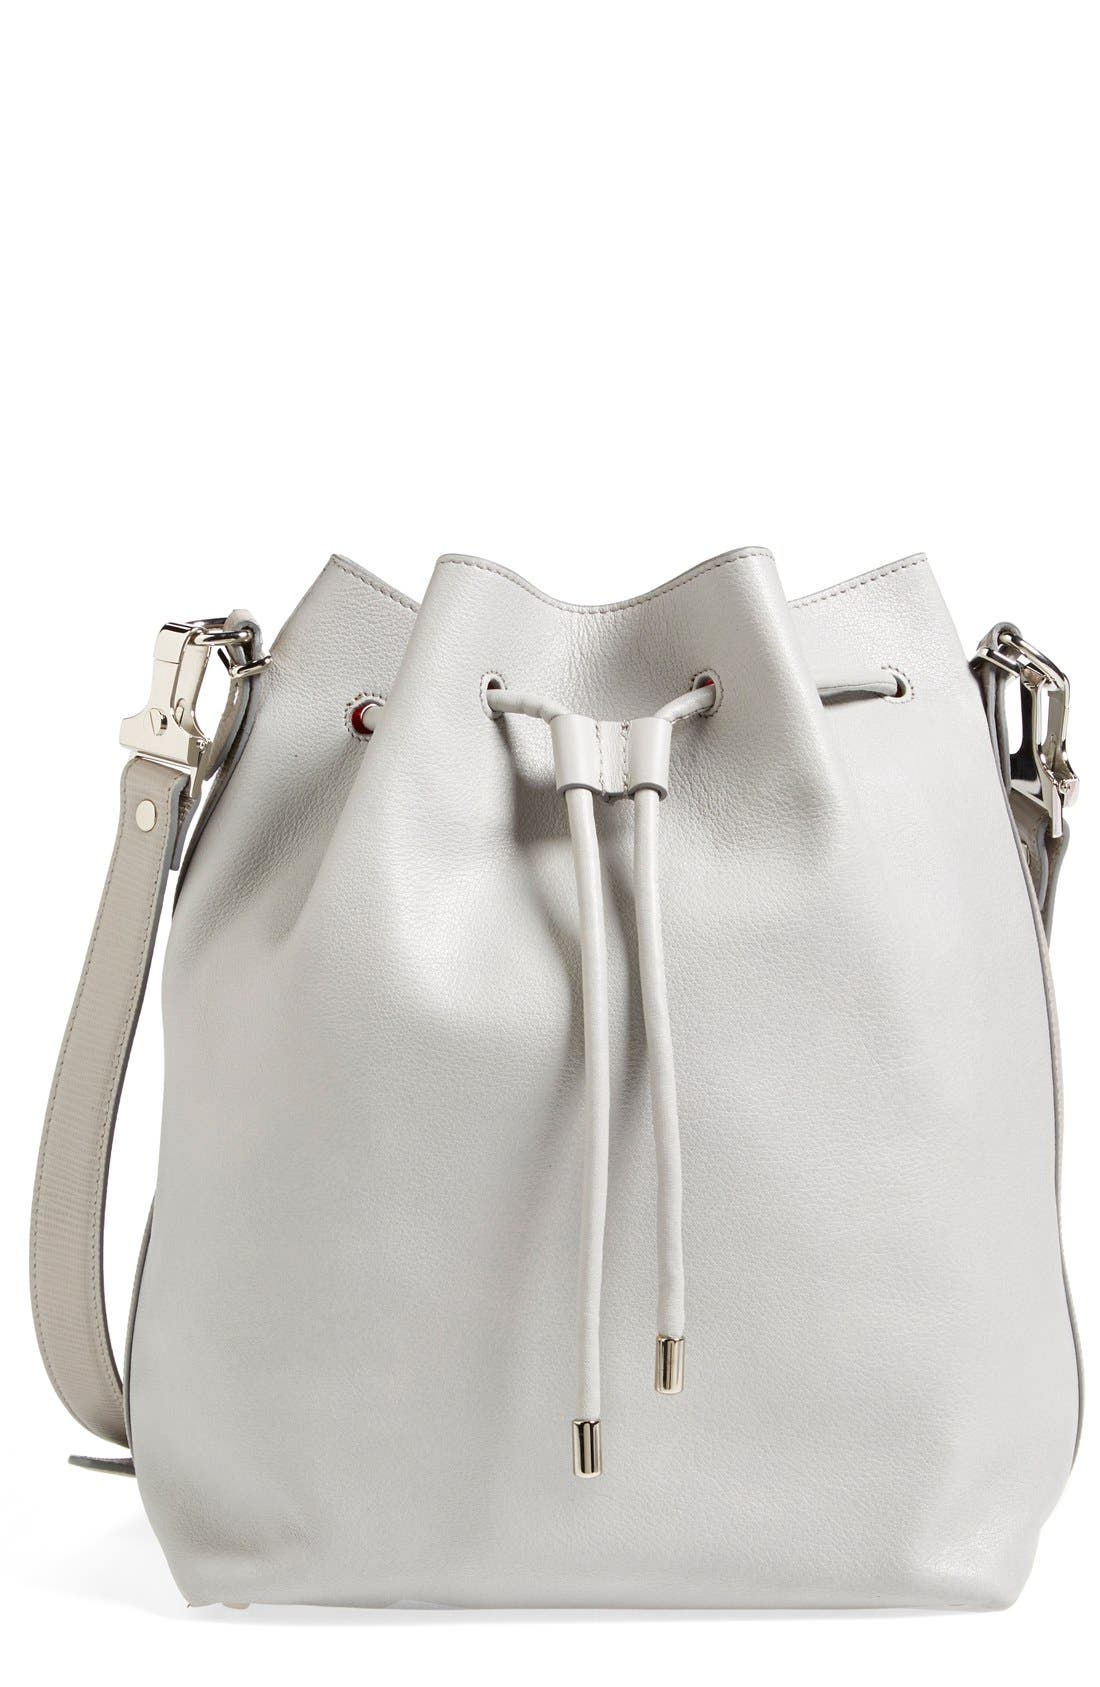 Main Image - Proenza Schouler 'Medium' Bucket Bag